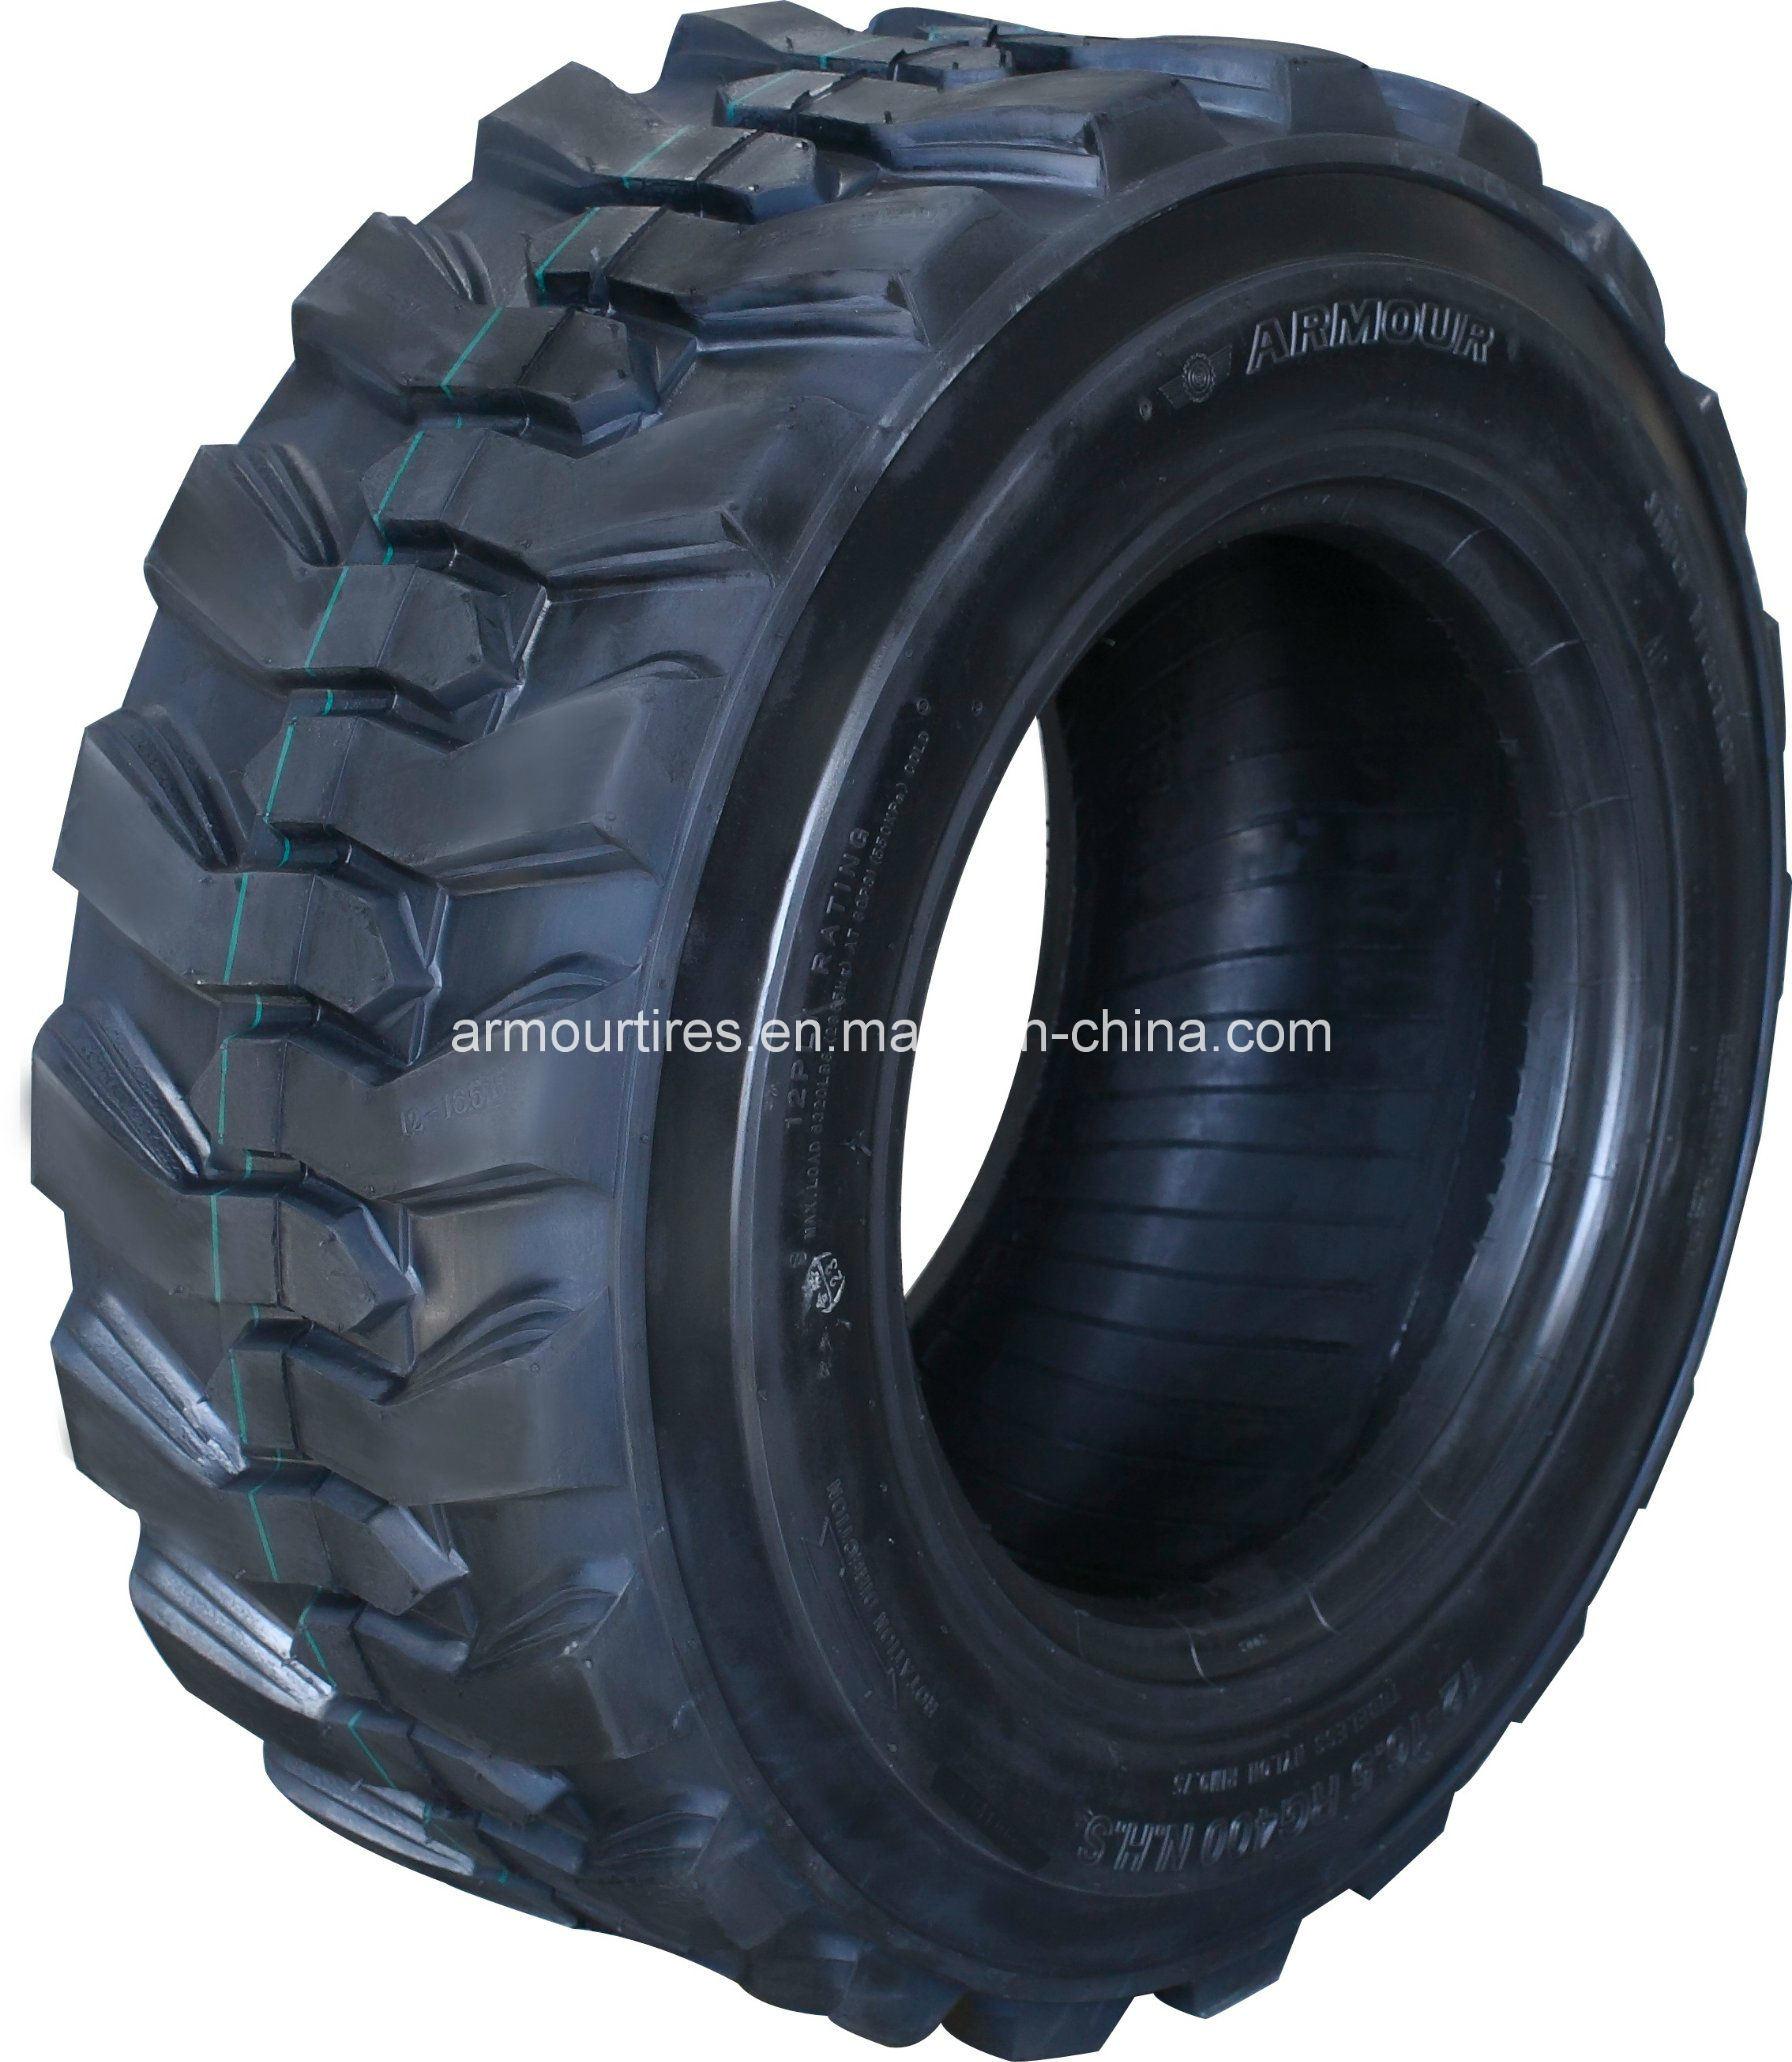 (10-16.5, 12-16.5, 14-17.5, 15-19.5 RG400/RG500) Industrial Tire for Skid Steer Purpose (JCB, BOBCAT)